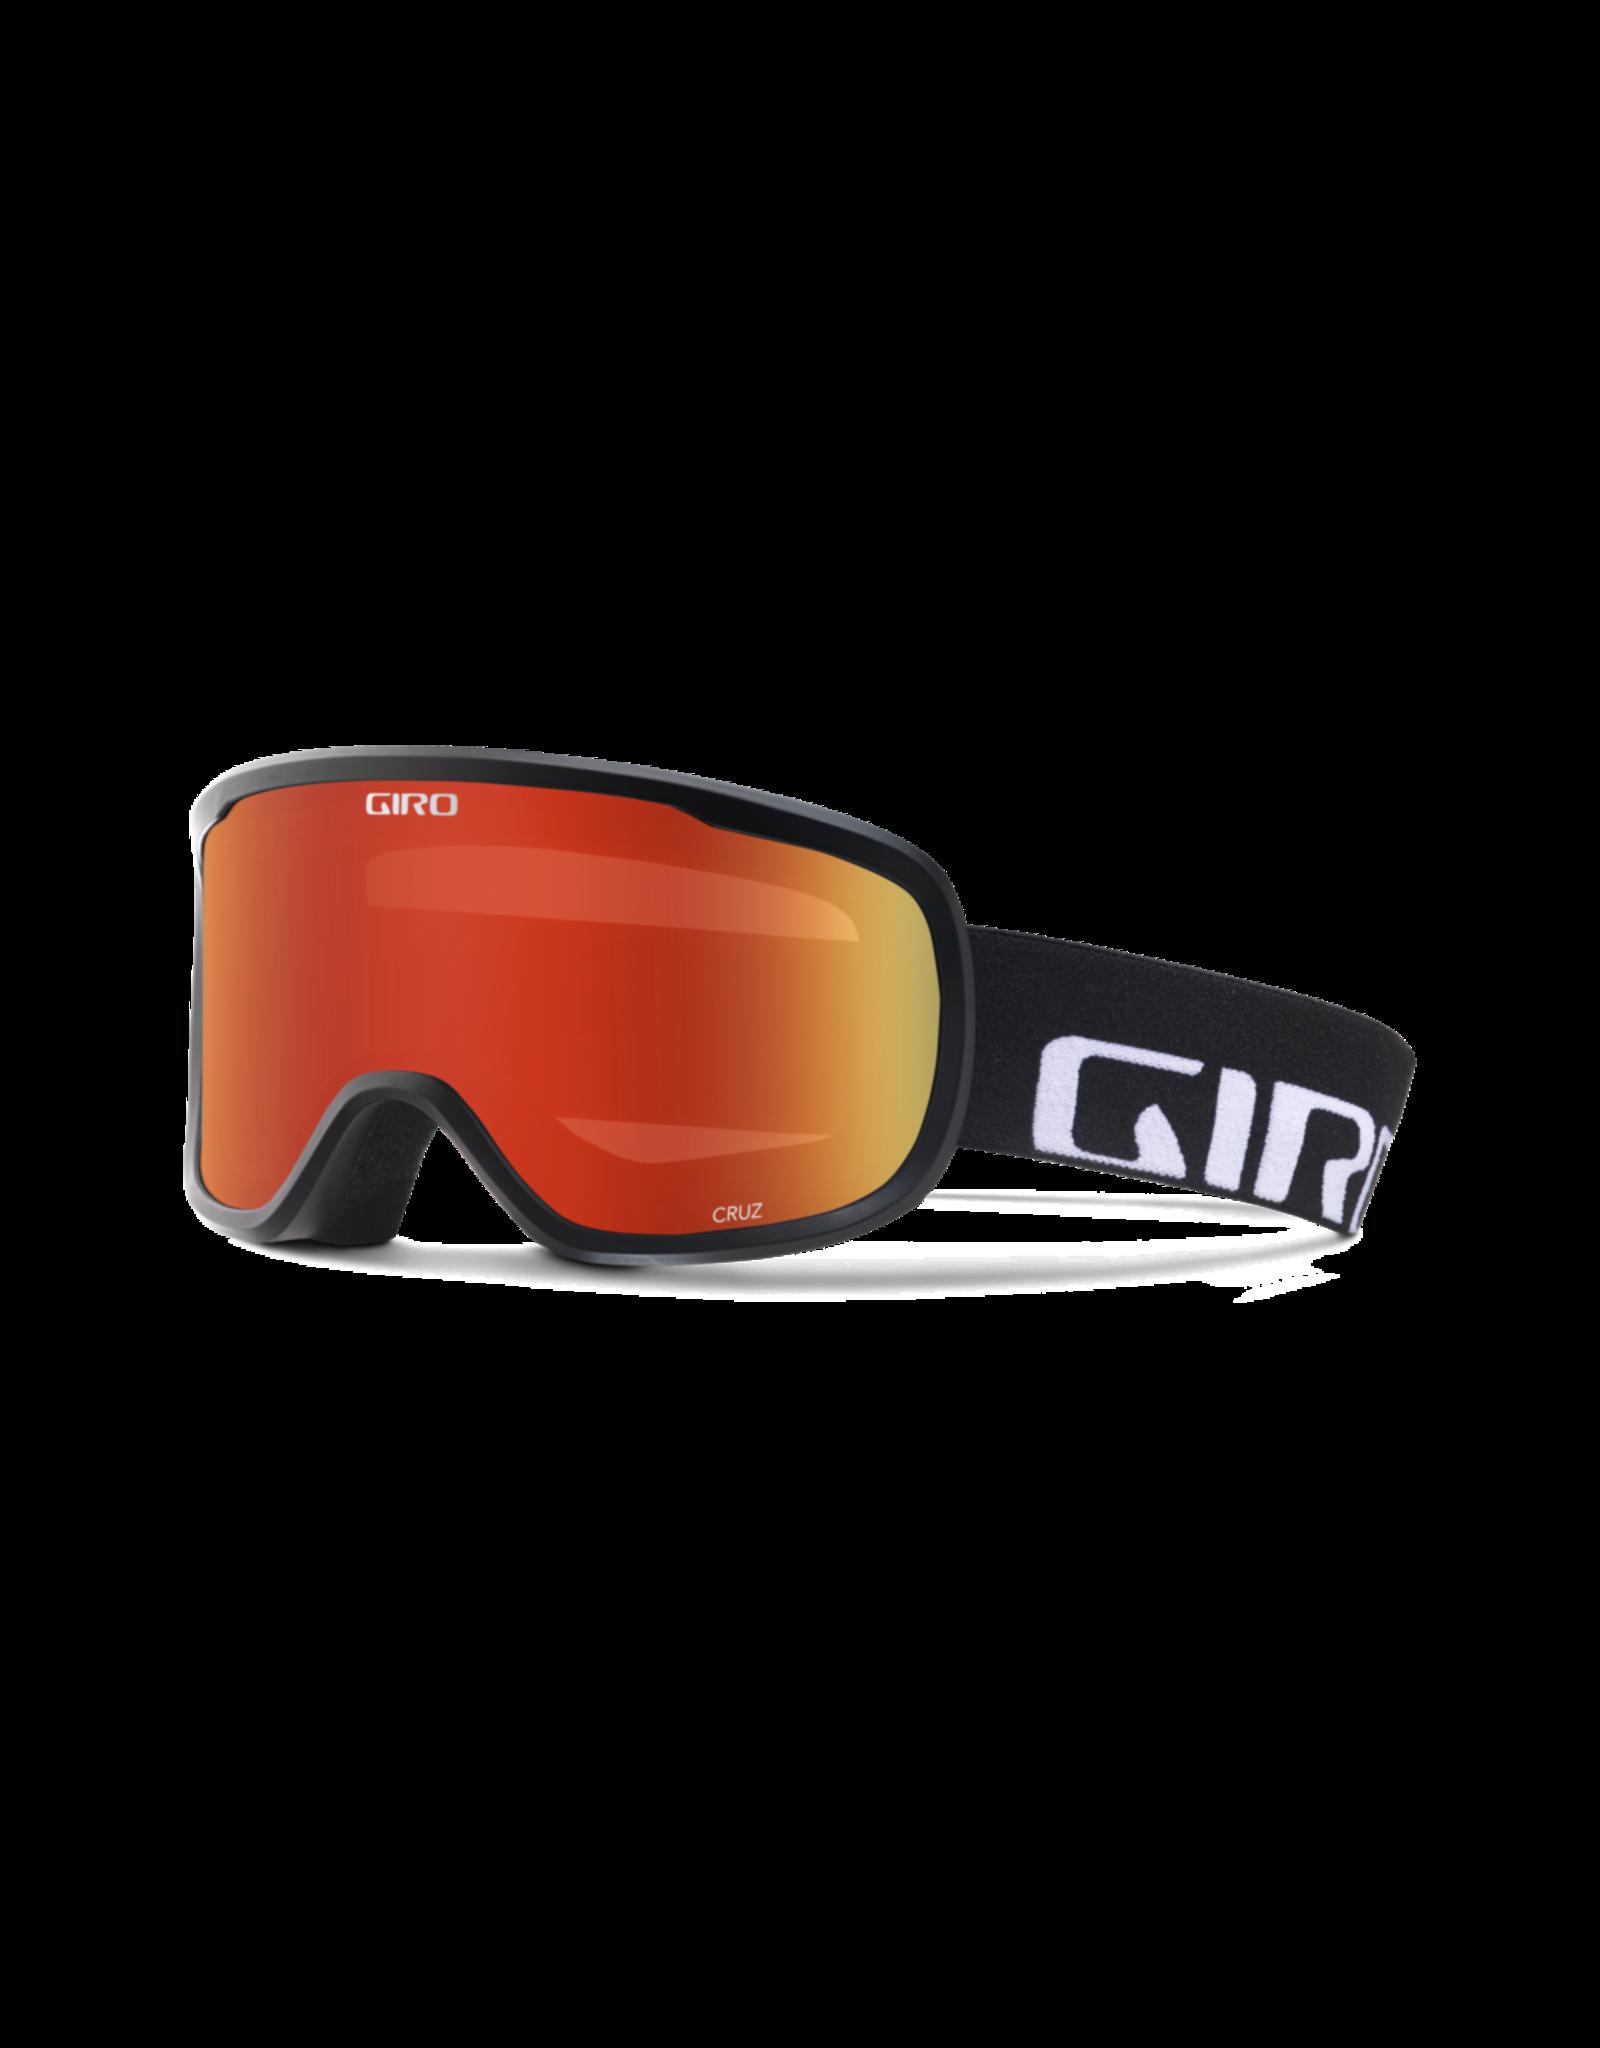 Giro GIRO CRUZ BLACK WDMRK AMBR SCLT SR 20 SKI GOGGLE